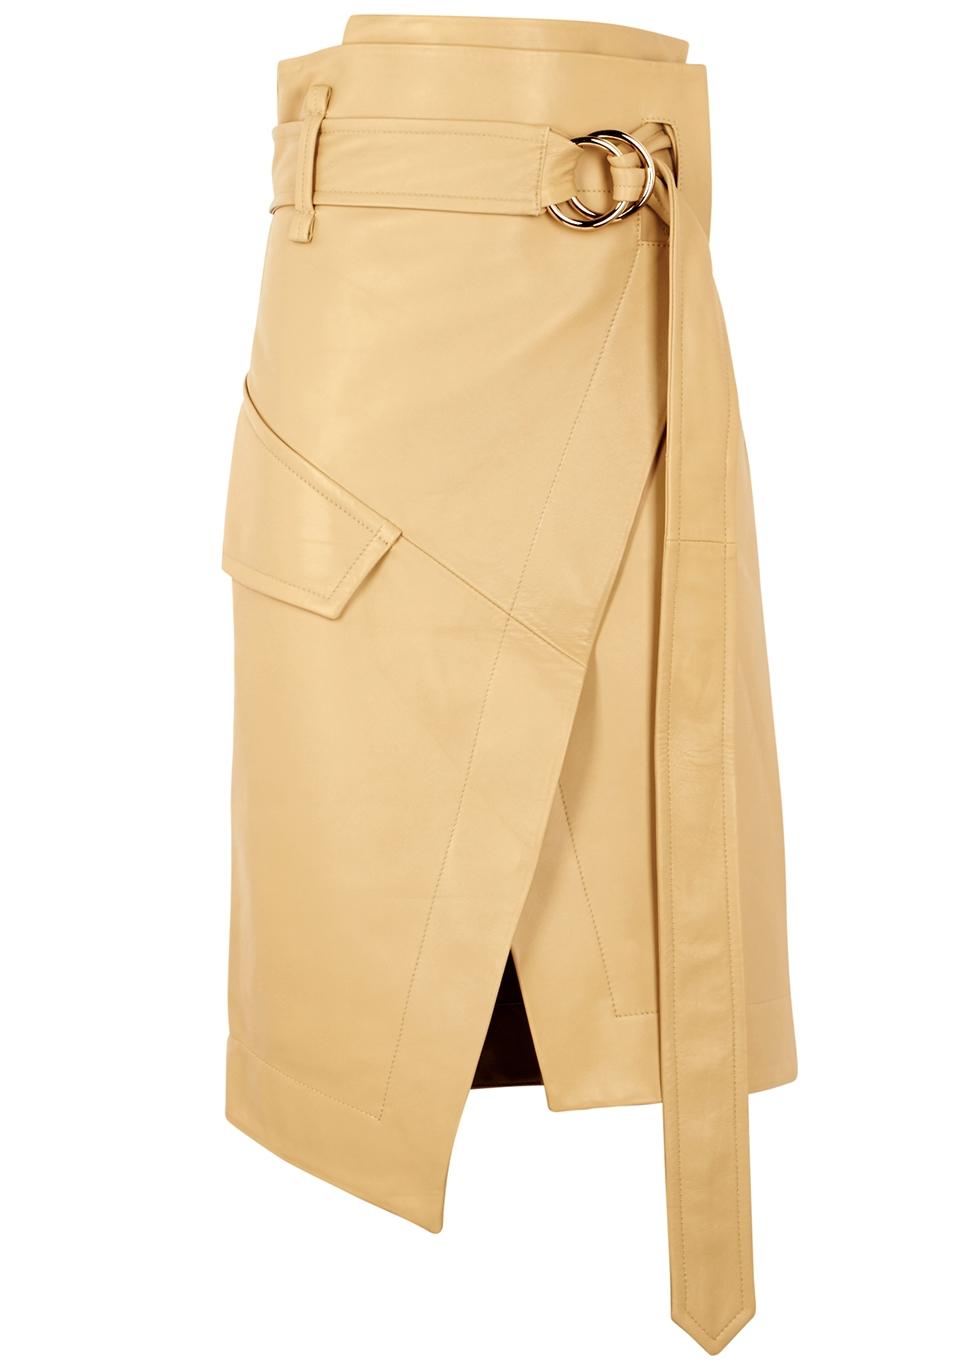 e8b830ea0 Damenmode UNICORN LONDON Womens Real Leather Skirt Black BRAND NEW #6S